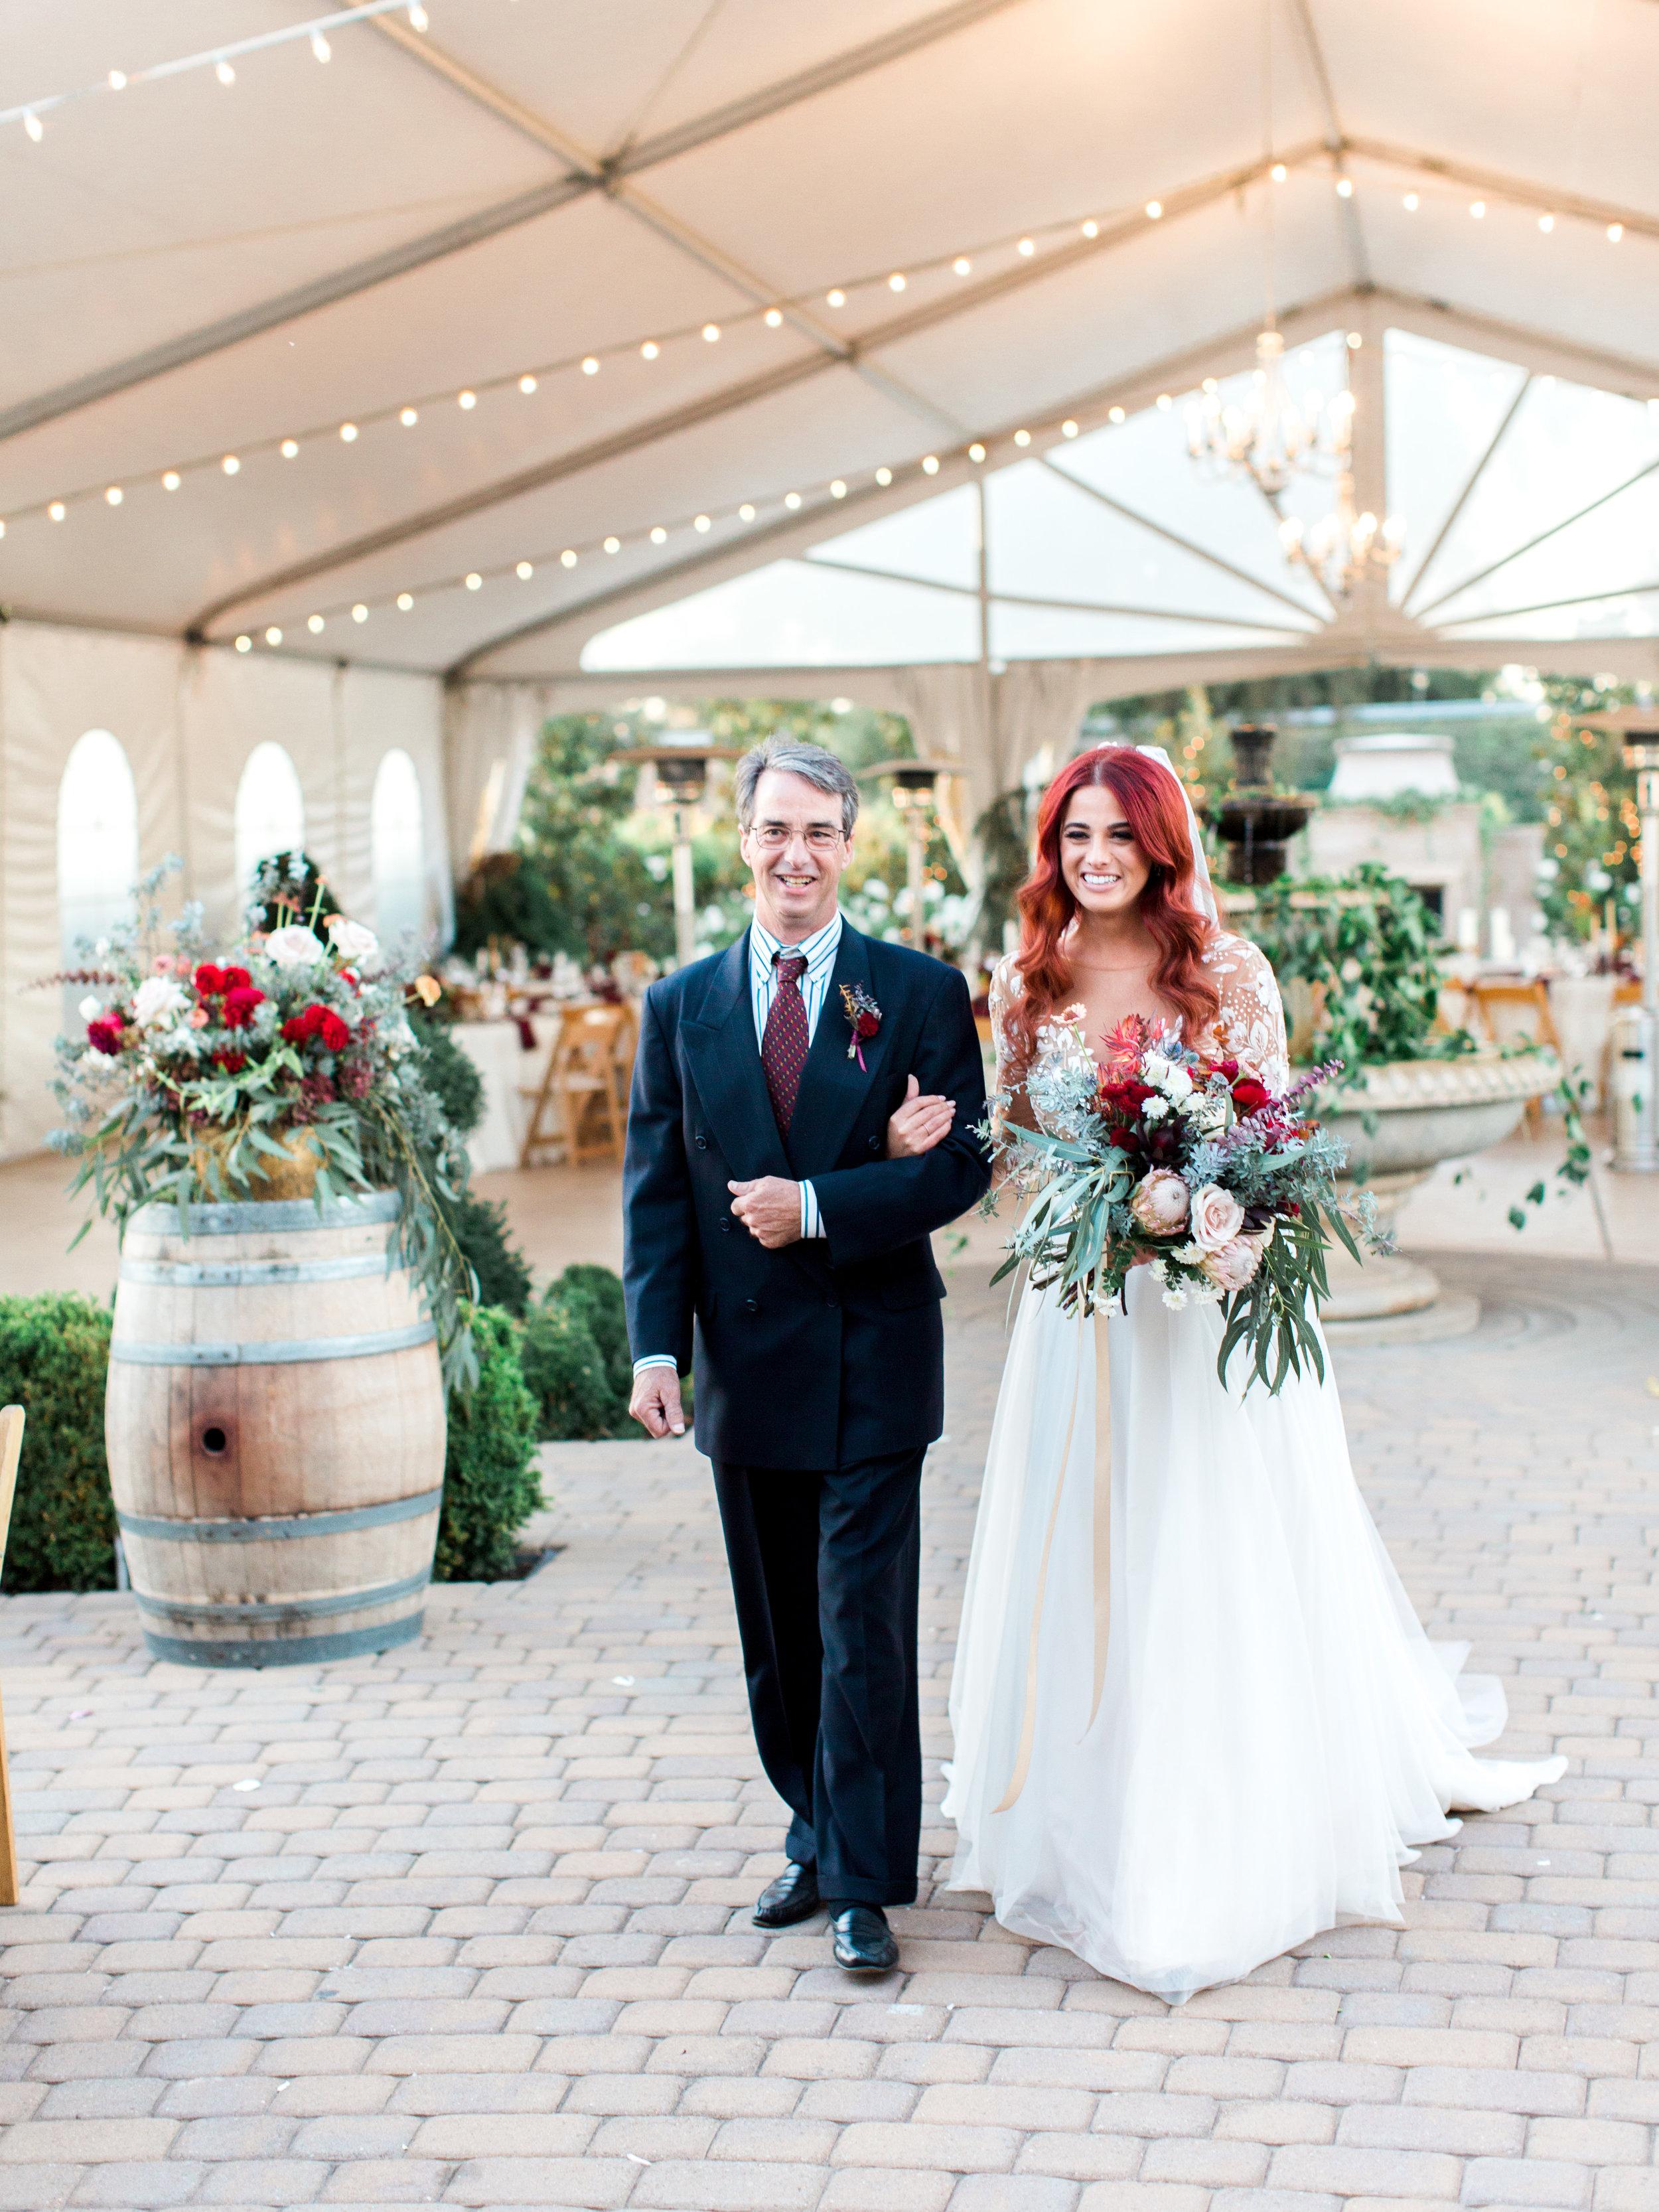 fall-inspired-wedding-at-scribner-bend-vineyards-in-sacramento-california-1-9.jpg